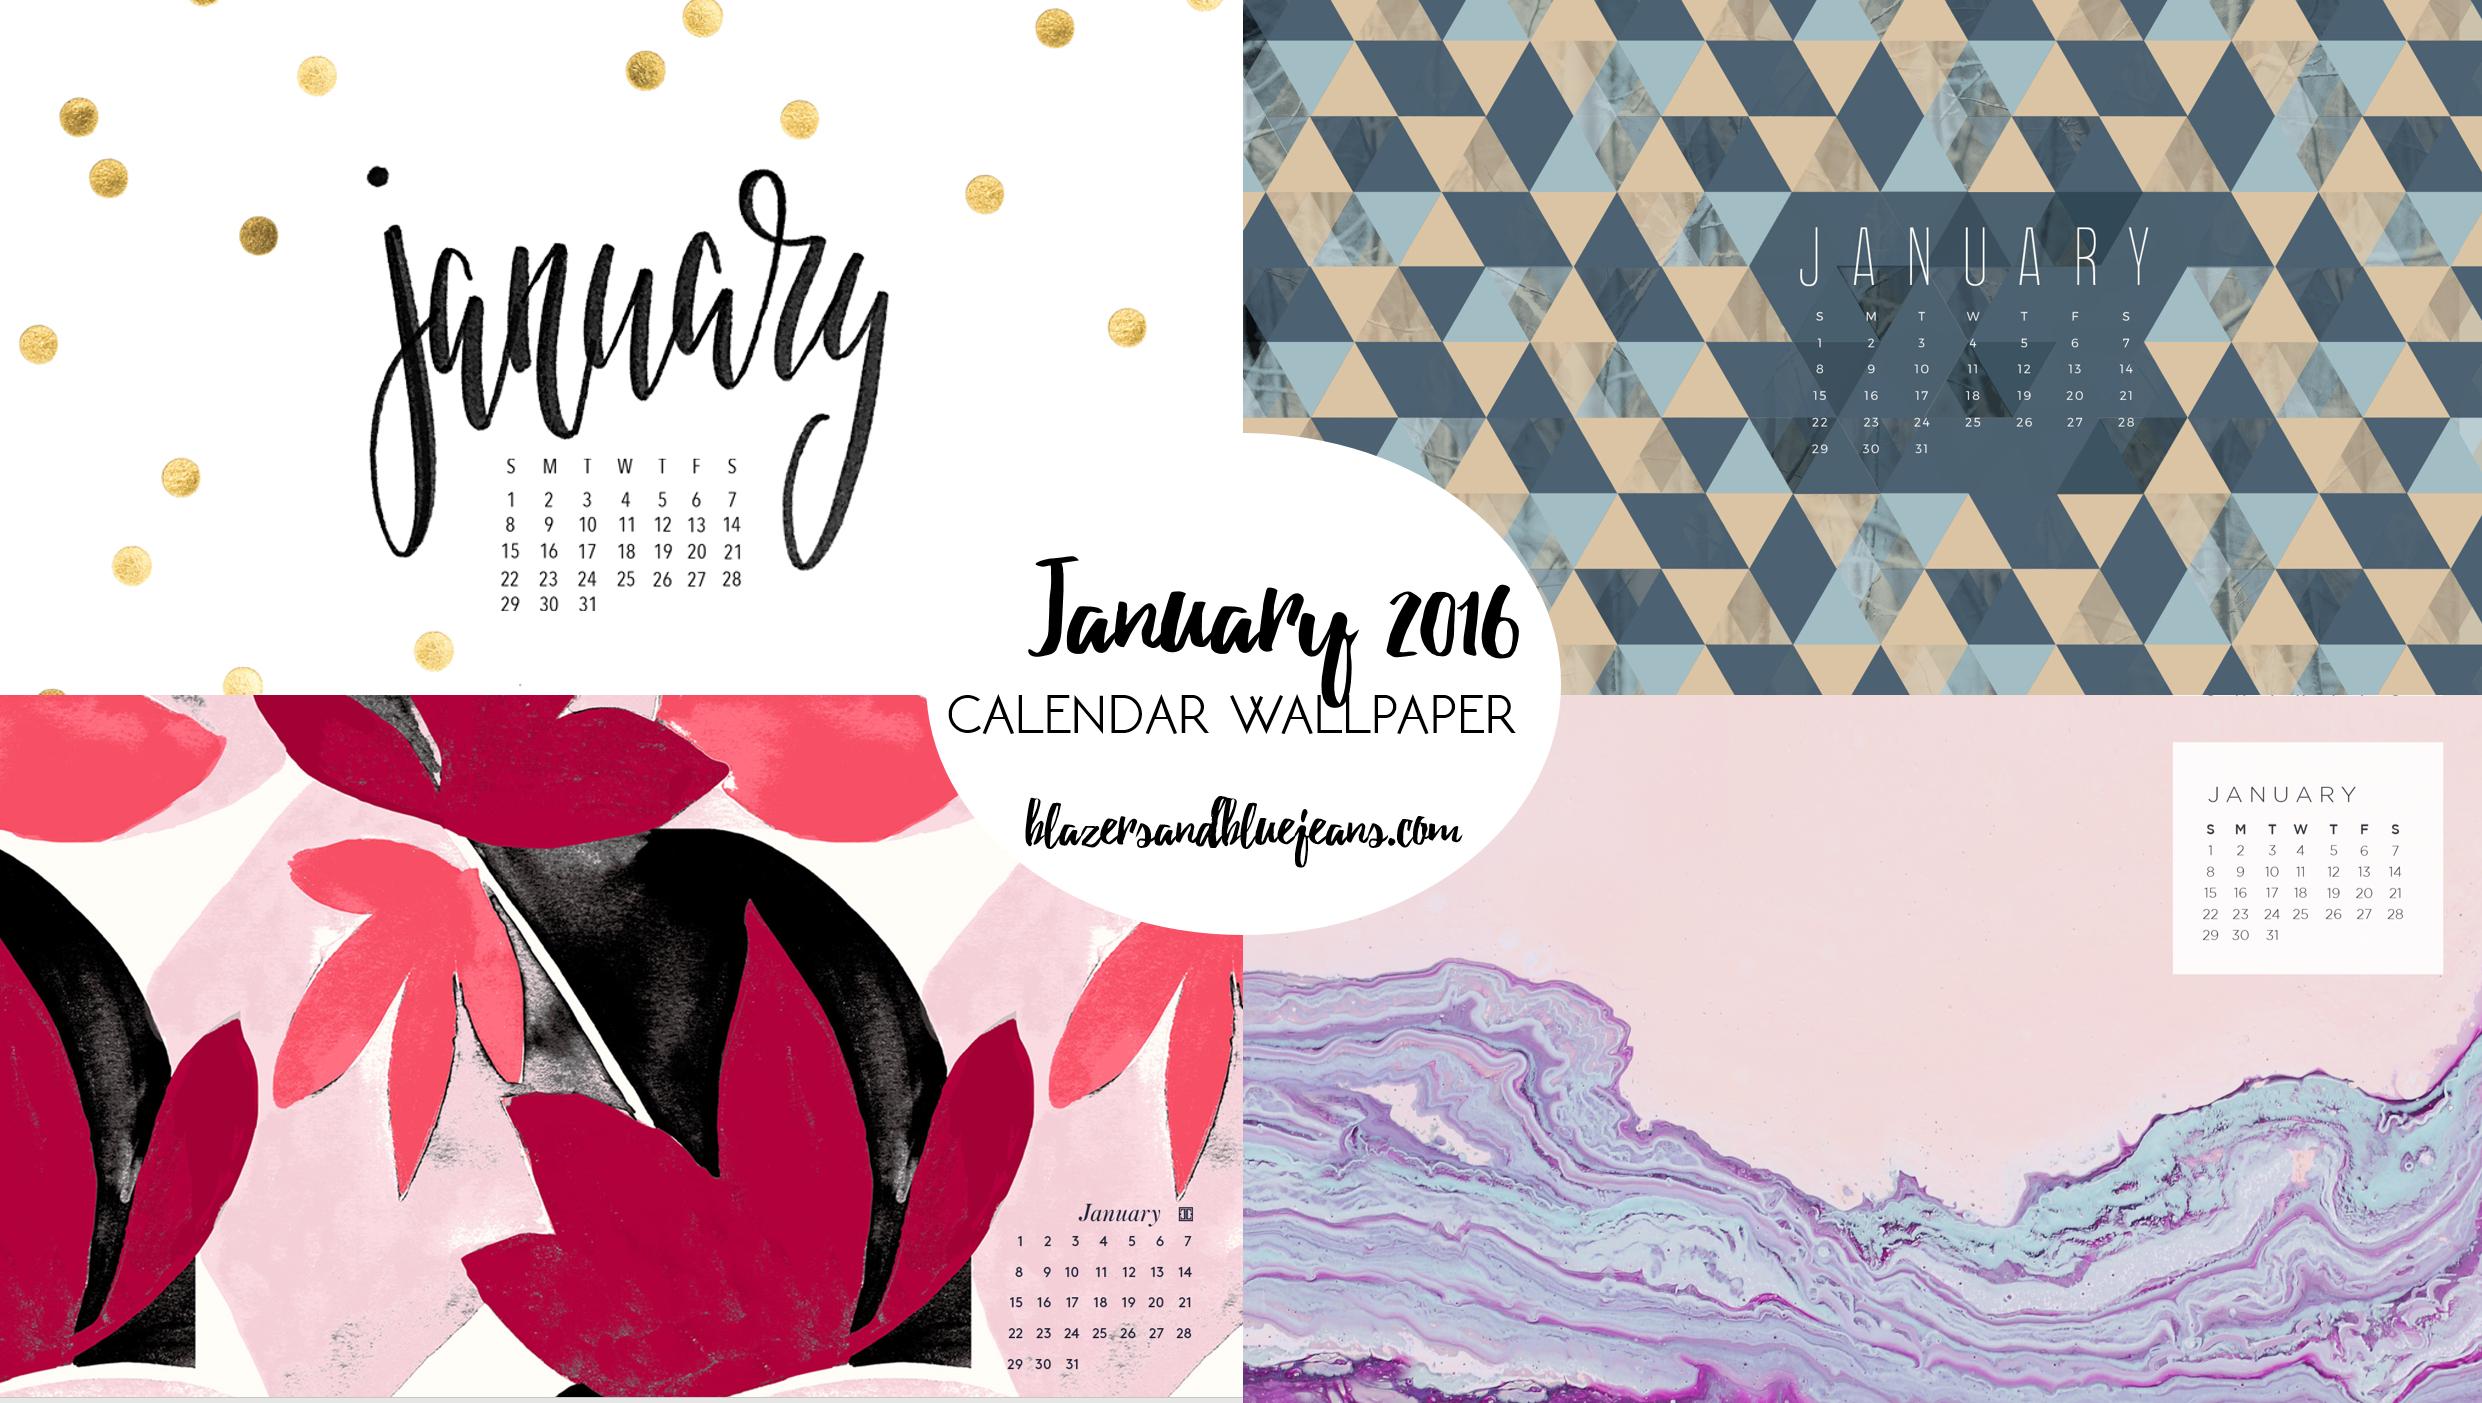 Calendar Wallpaper January 2017 : January calendar wallpaper blazers and blue jeans